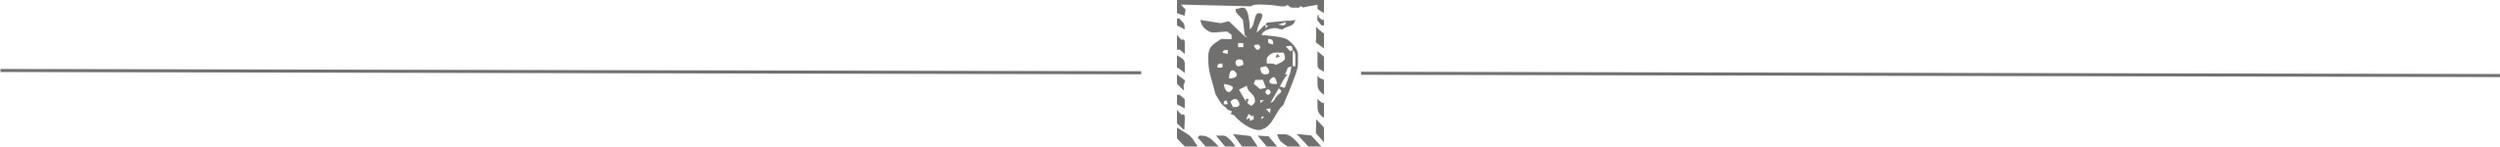 strawberry line.jpg